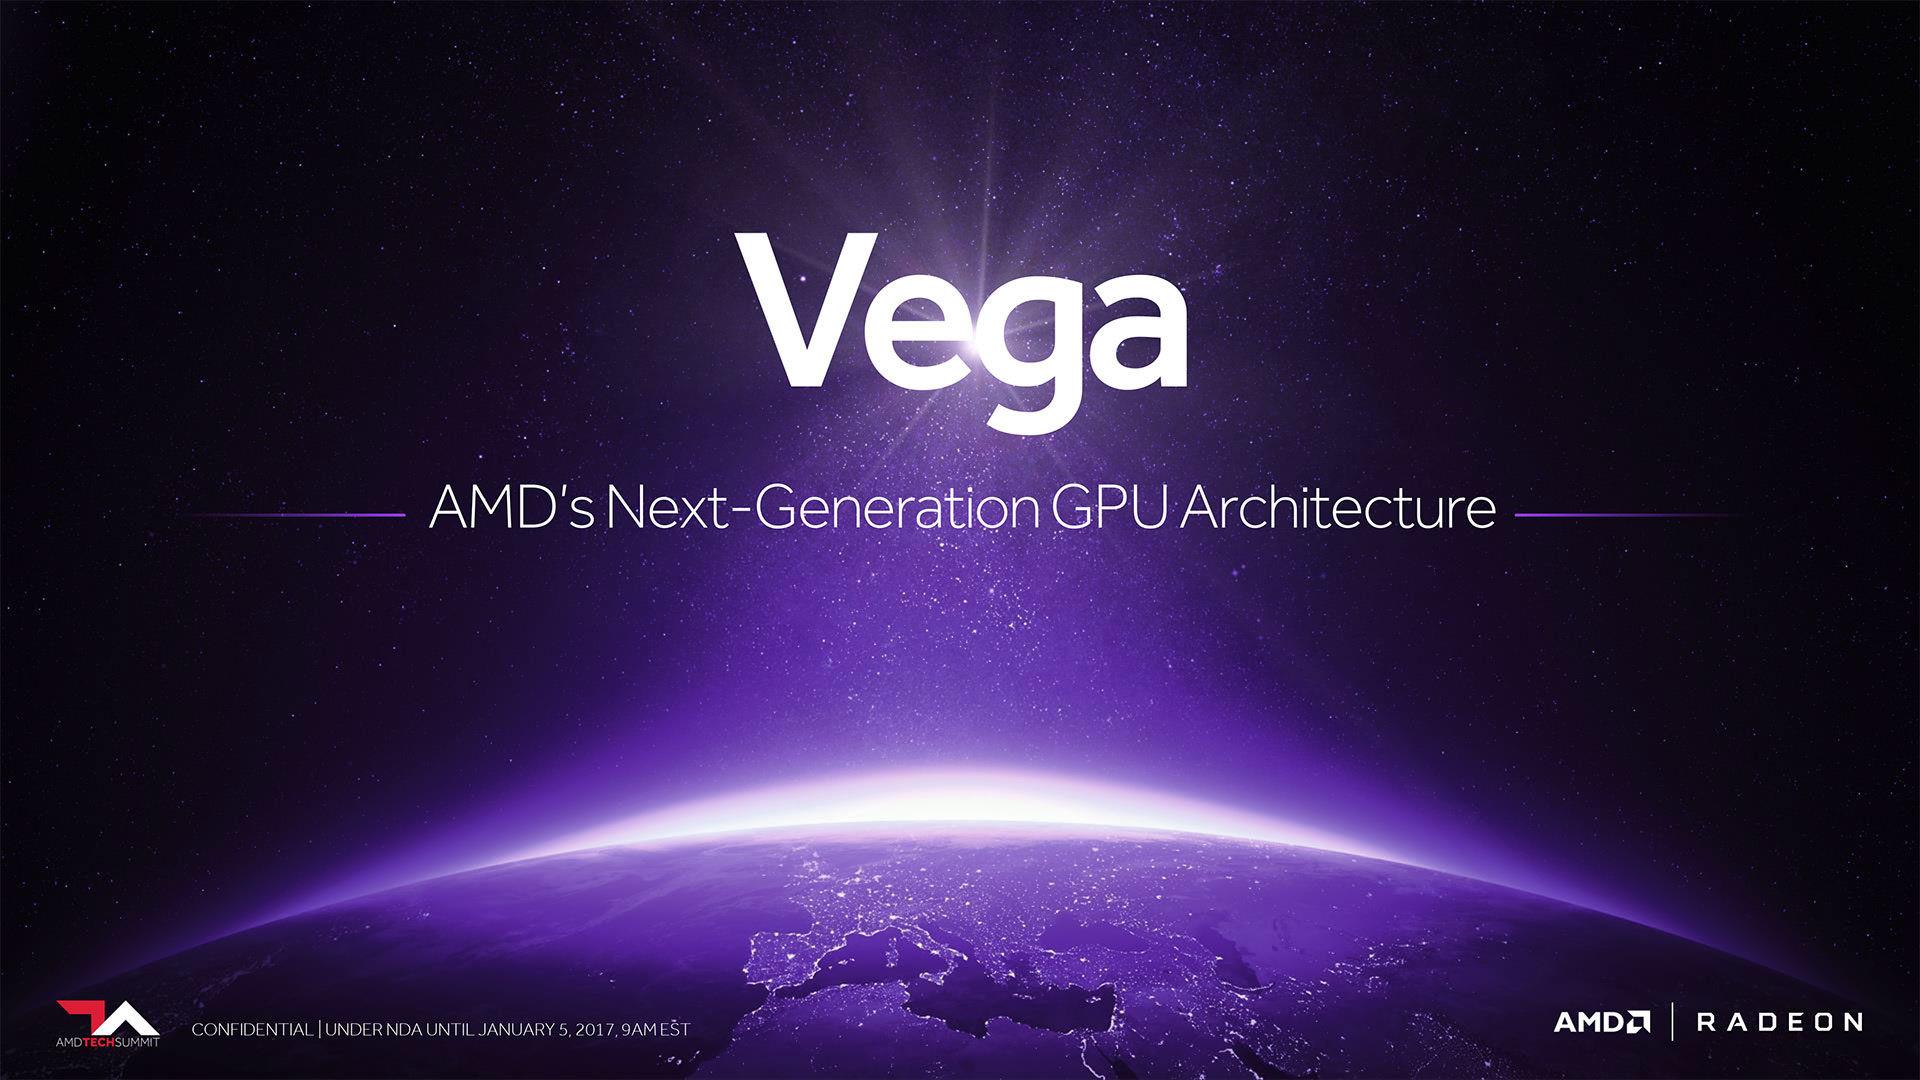 AMD-Vega-Radeon-Next-Generation-GPU-1920